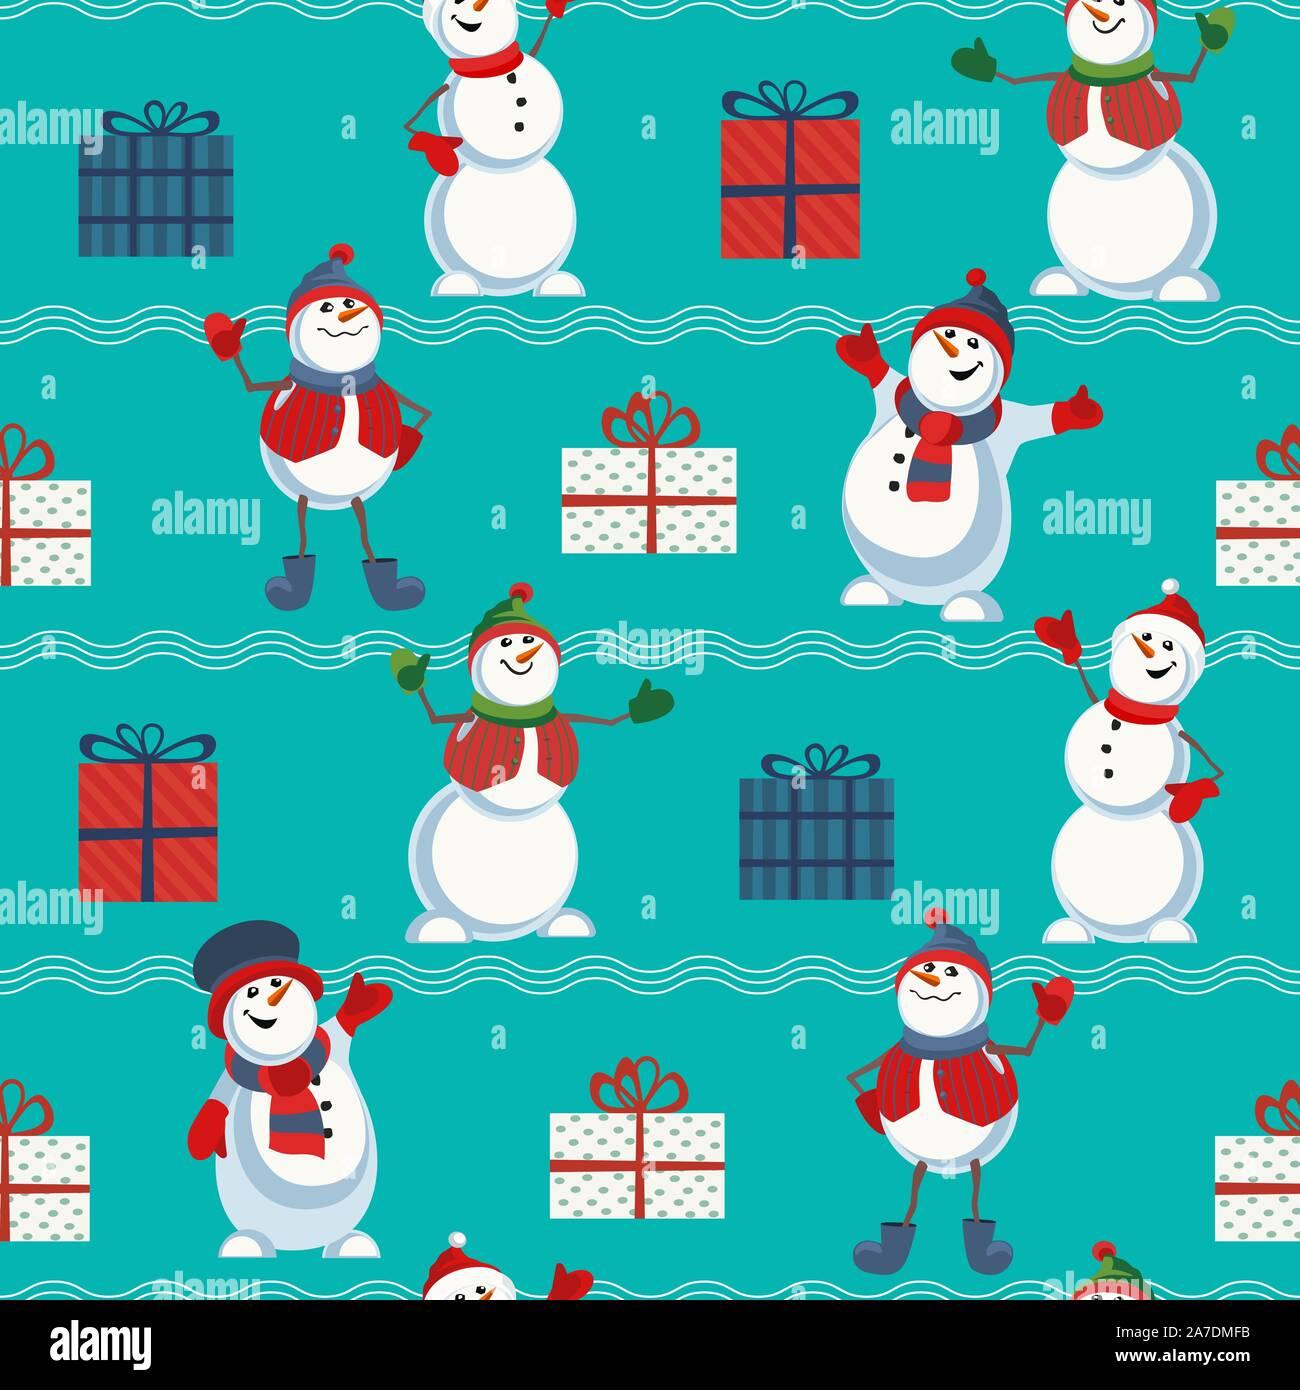 cute snowman hand drawn vector seamless pattern holiday cartoon fun snowball merry christmas winter season decorative wallpaper new year eve web ba 2A7DMFB